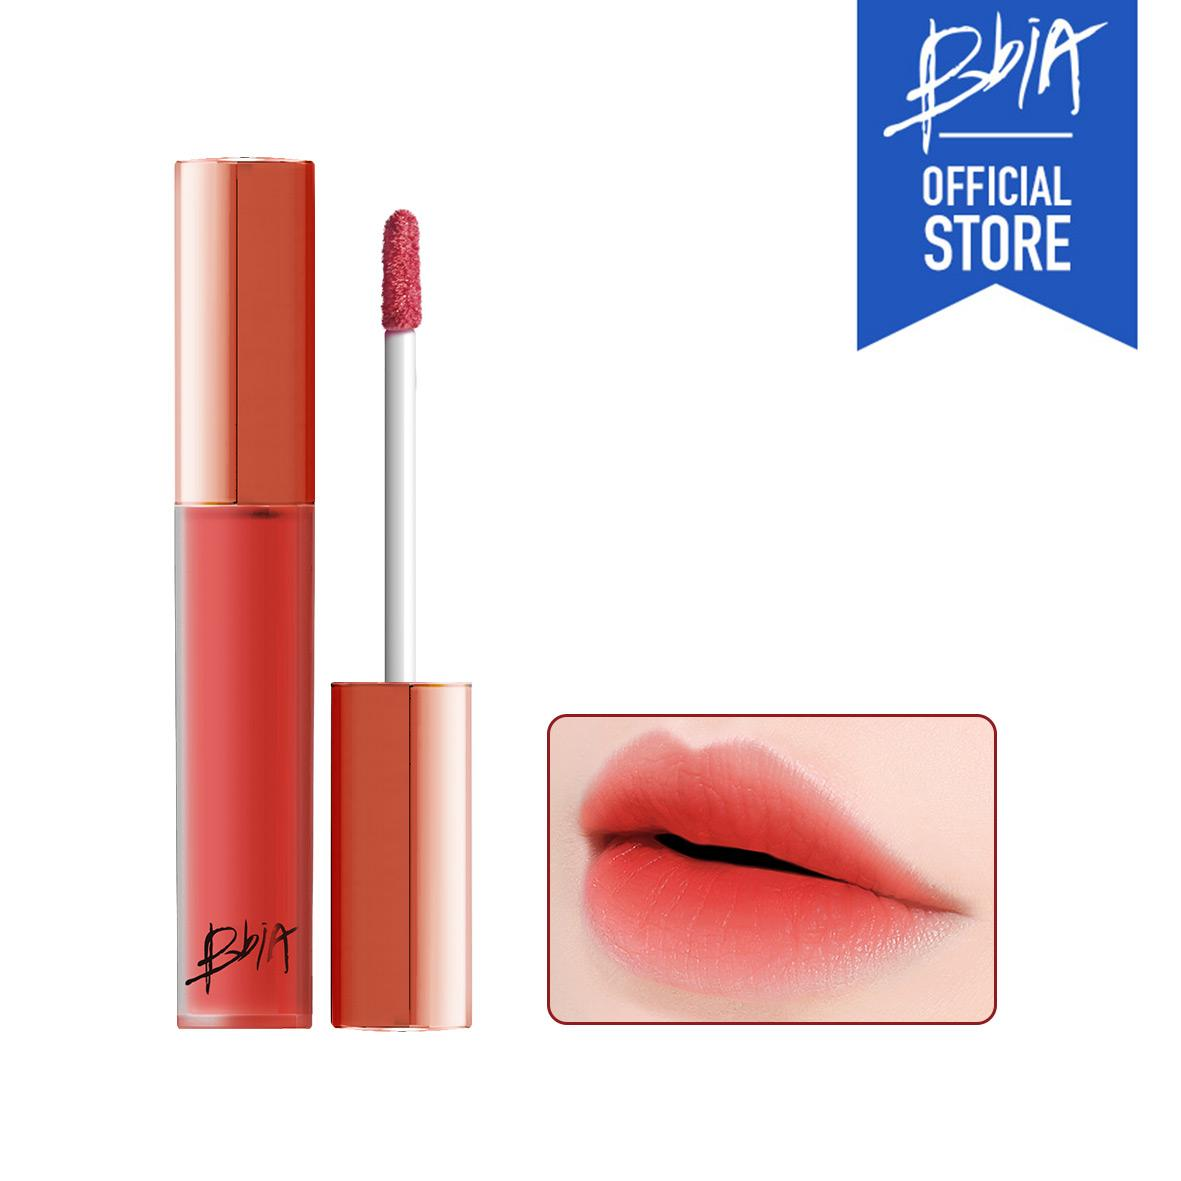 Son kem lì Bbia Last Velvet Lip Tint màu 17 - cam hồng coral tốt nhất